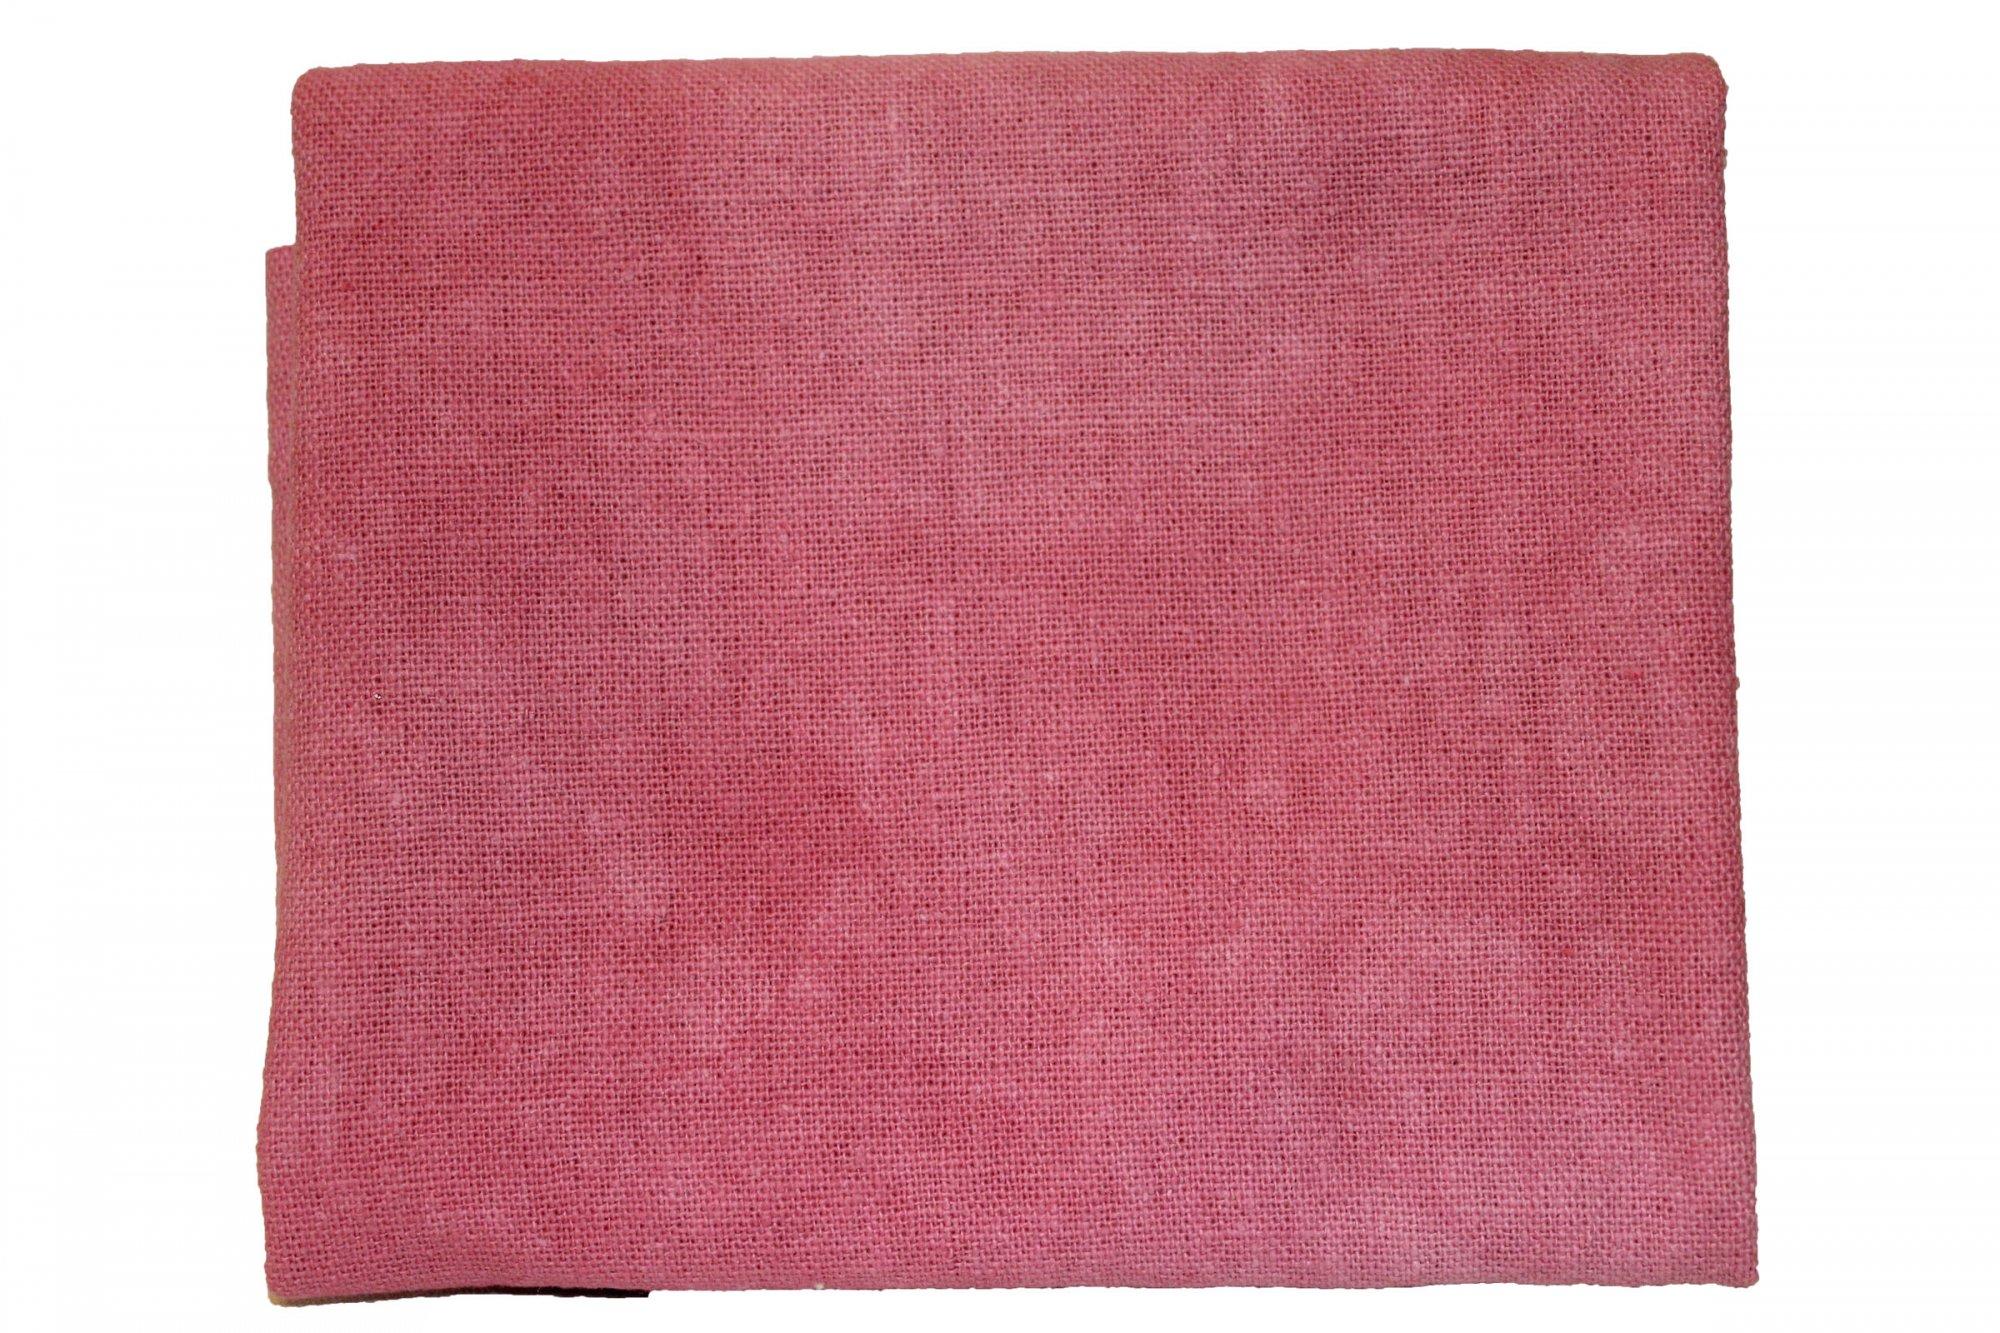 Peony Hand-dyed Linen